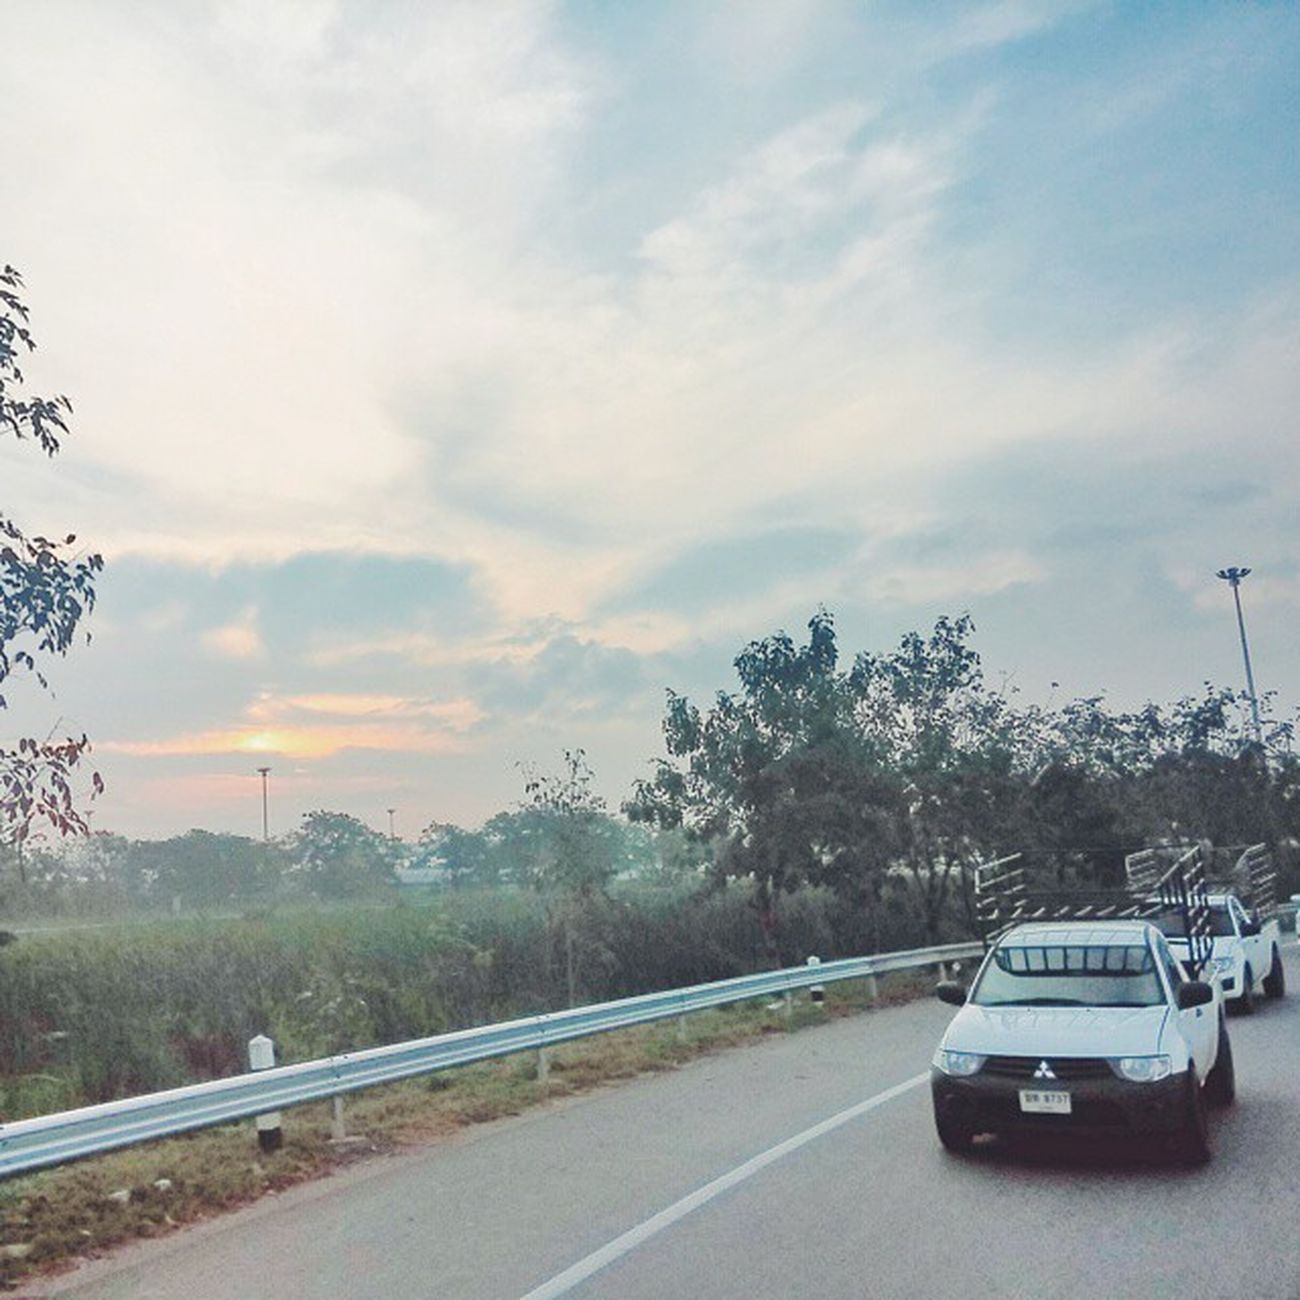 OTW 2 Kanchanaburi Vscocam Snapseed Pirab13 Jrcru sunrise